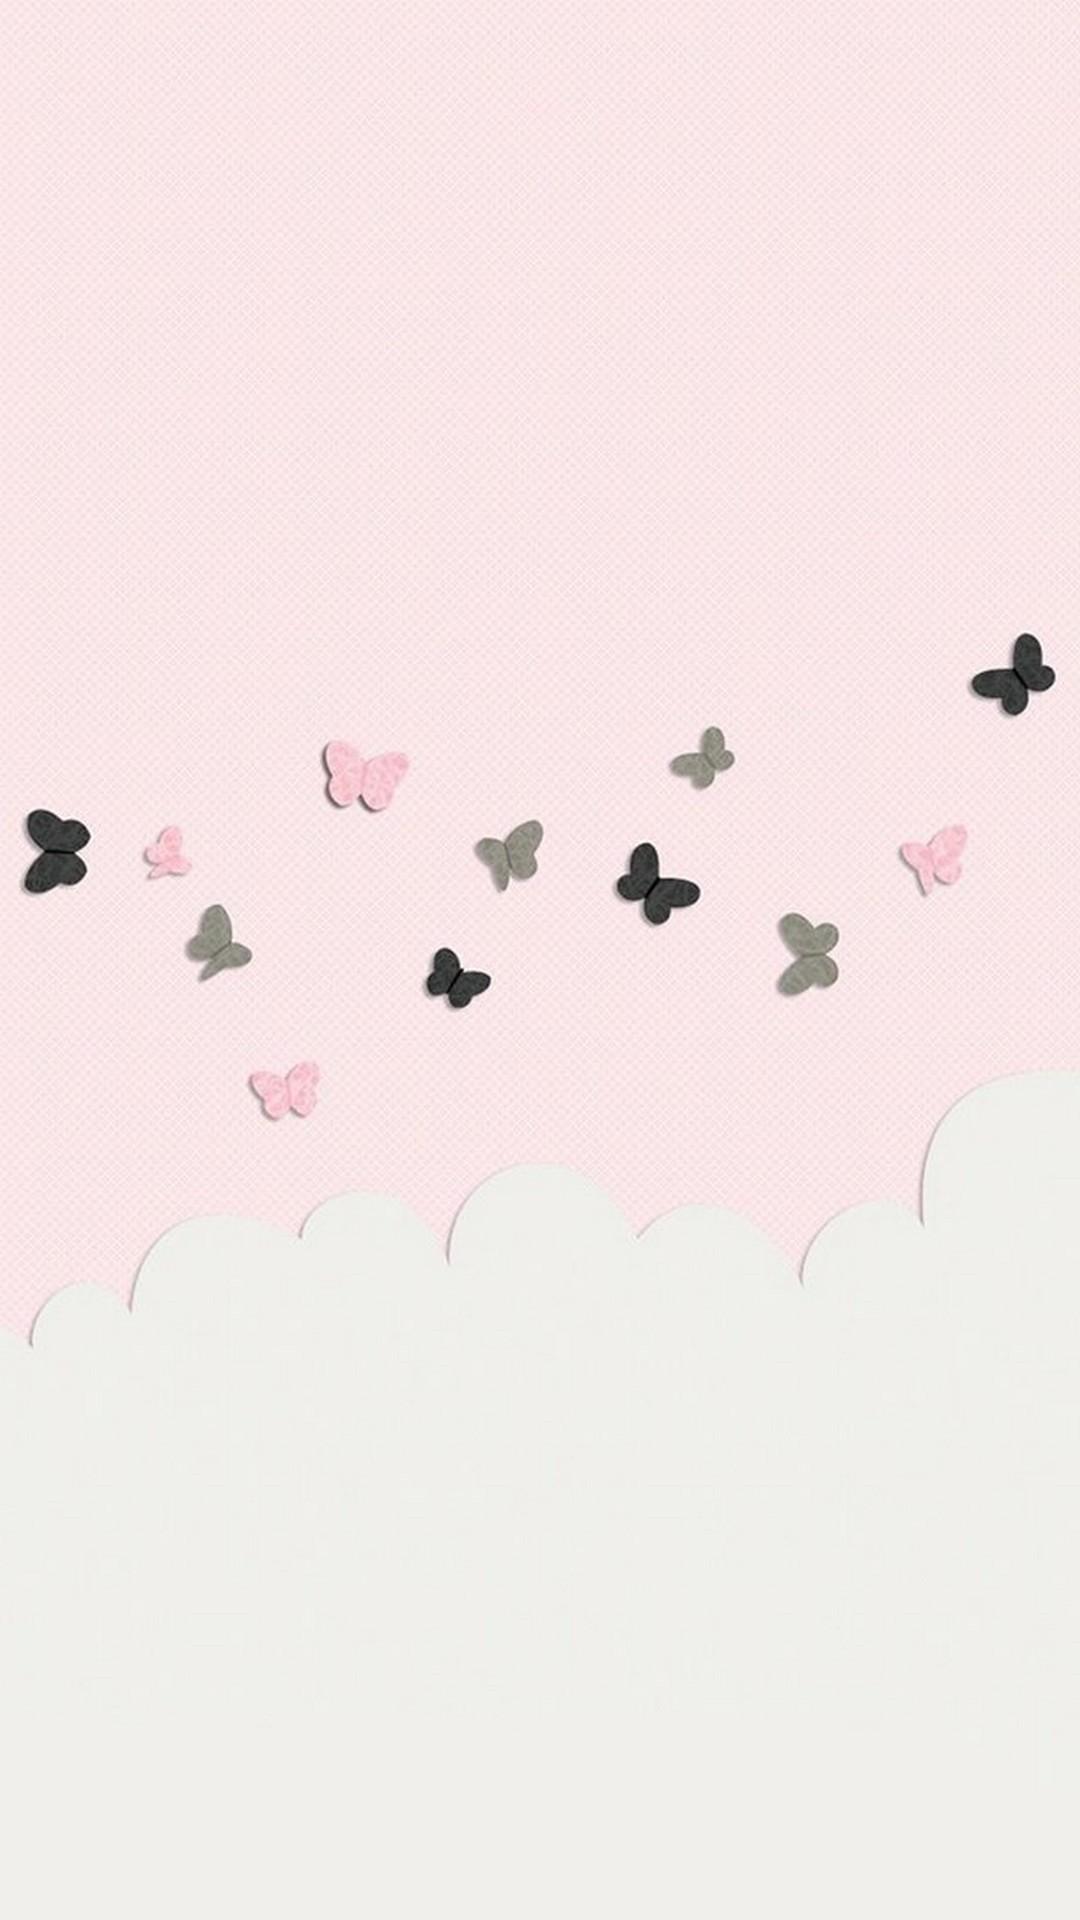 P Name Cute Wallpaper Pink Wallpaper For Mobile 2019 Cute Wallpapers